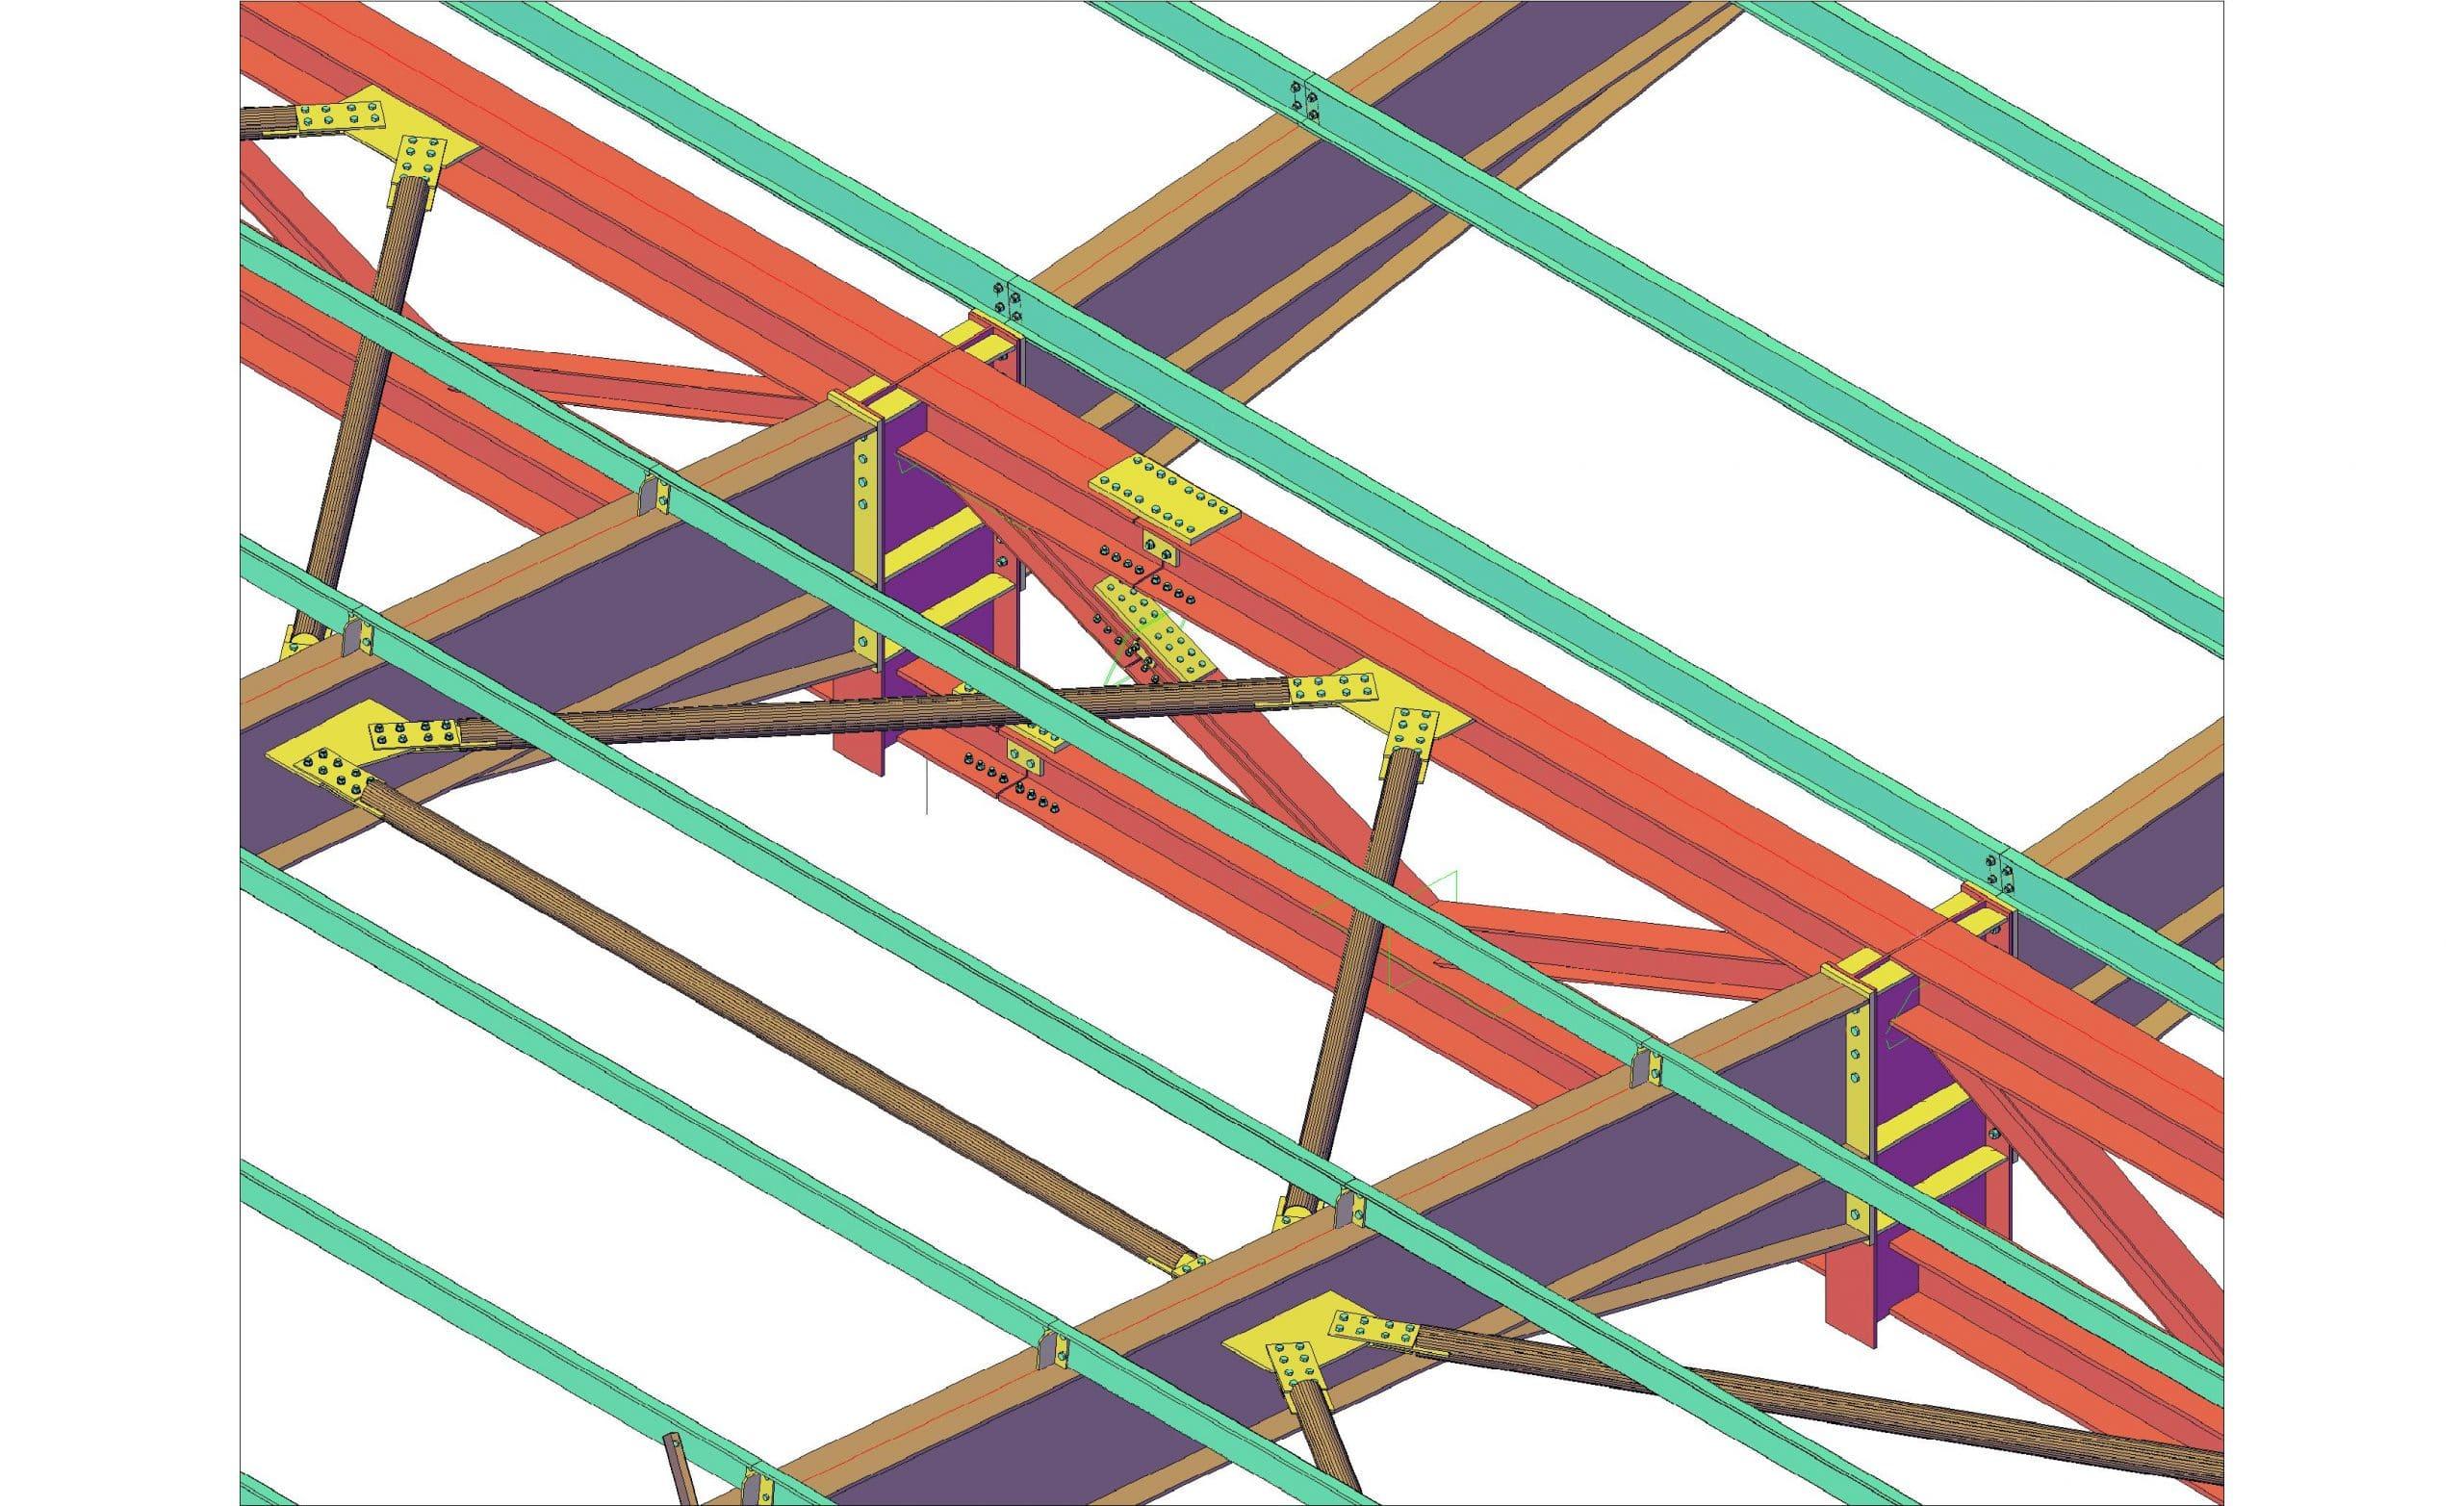 Portal Frame Fabrication Drawings